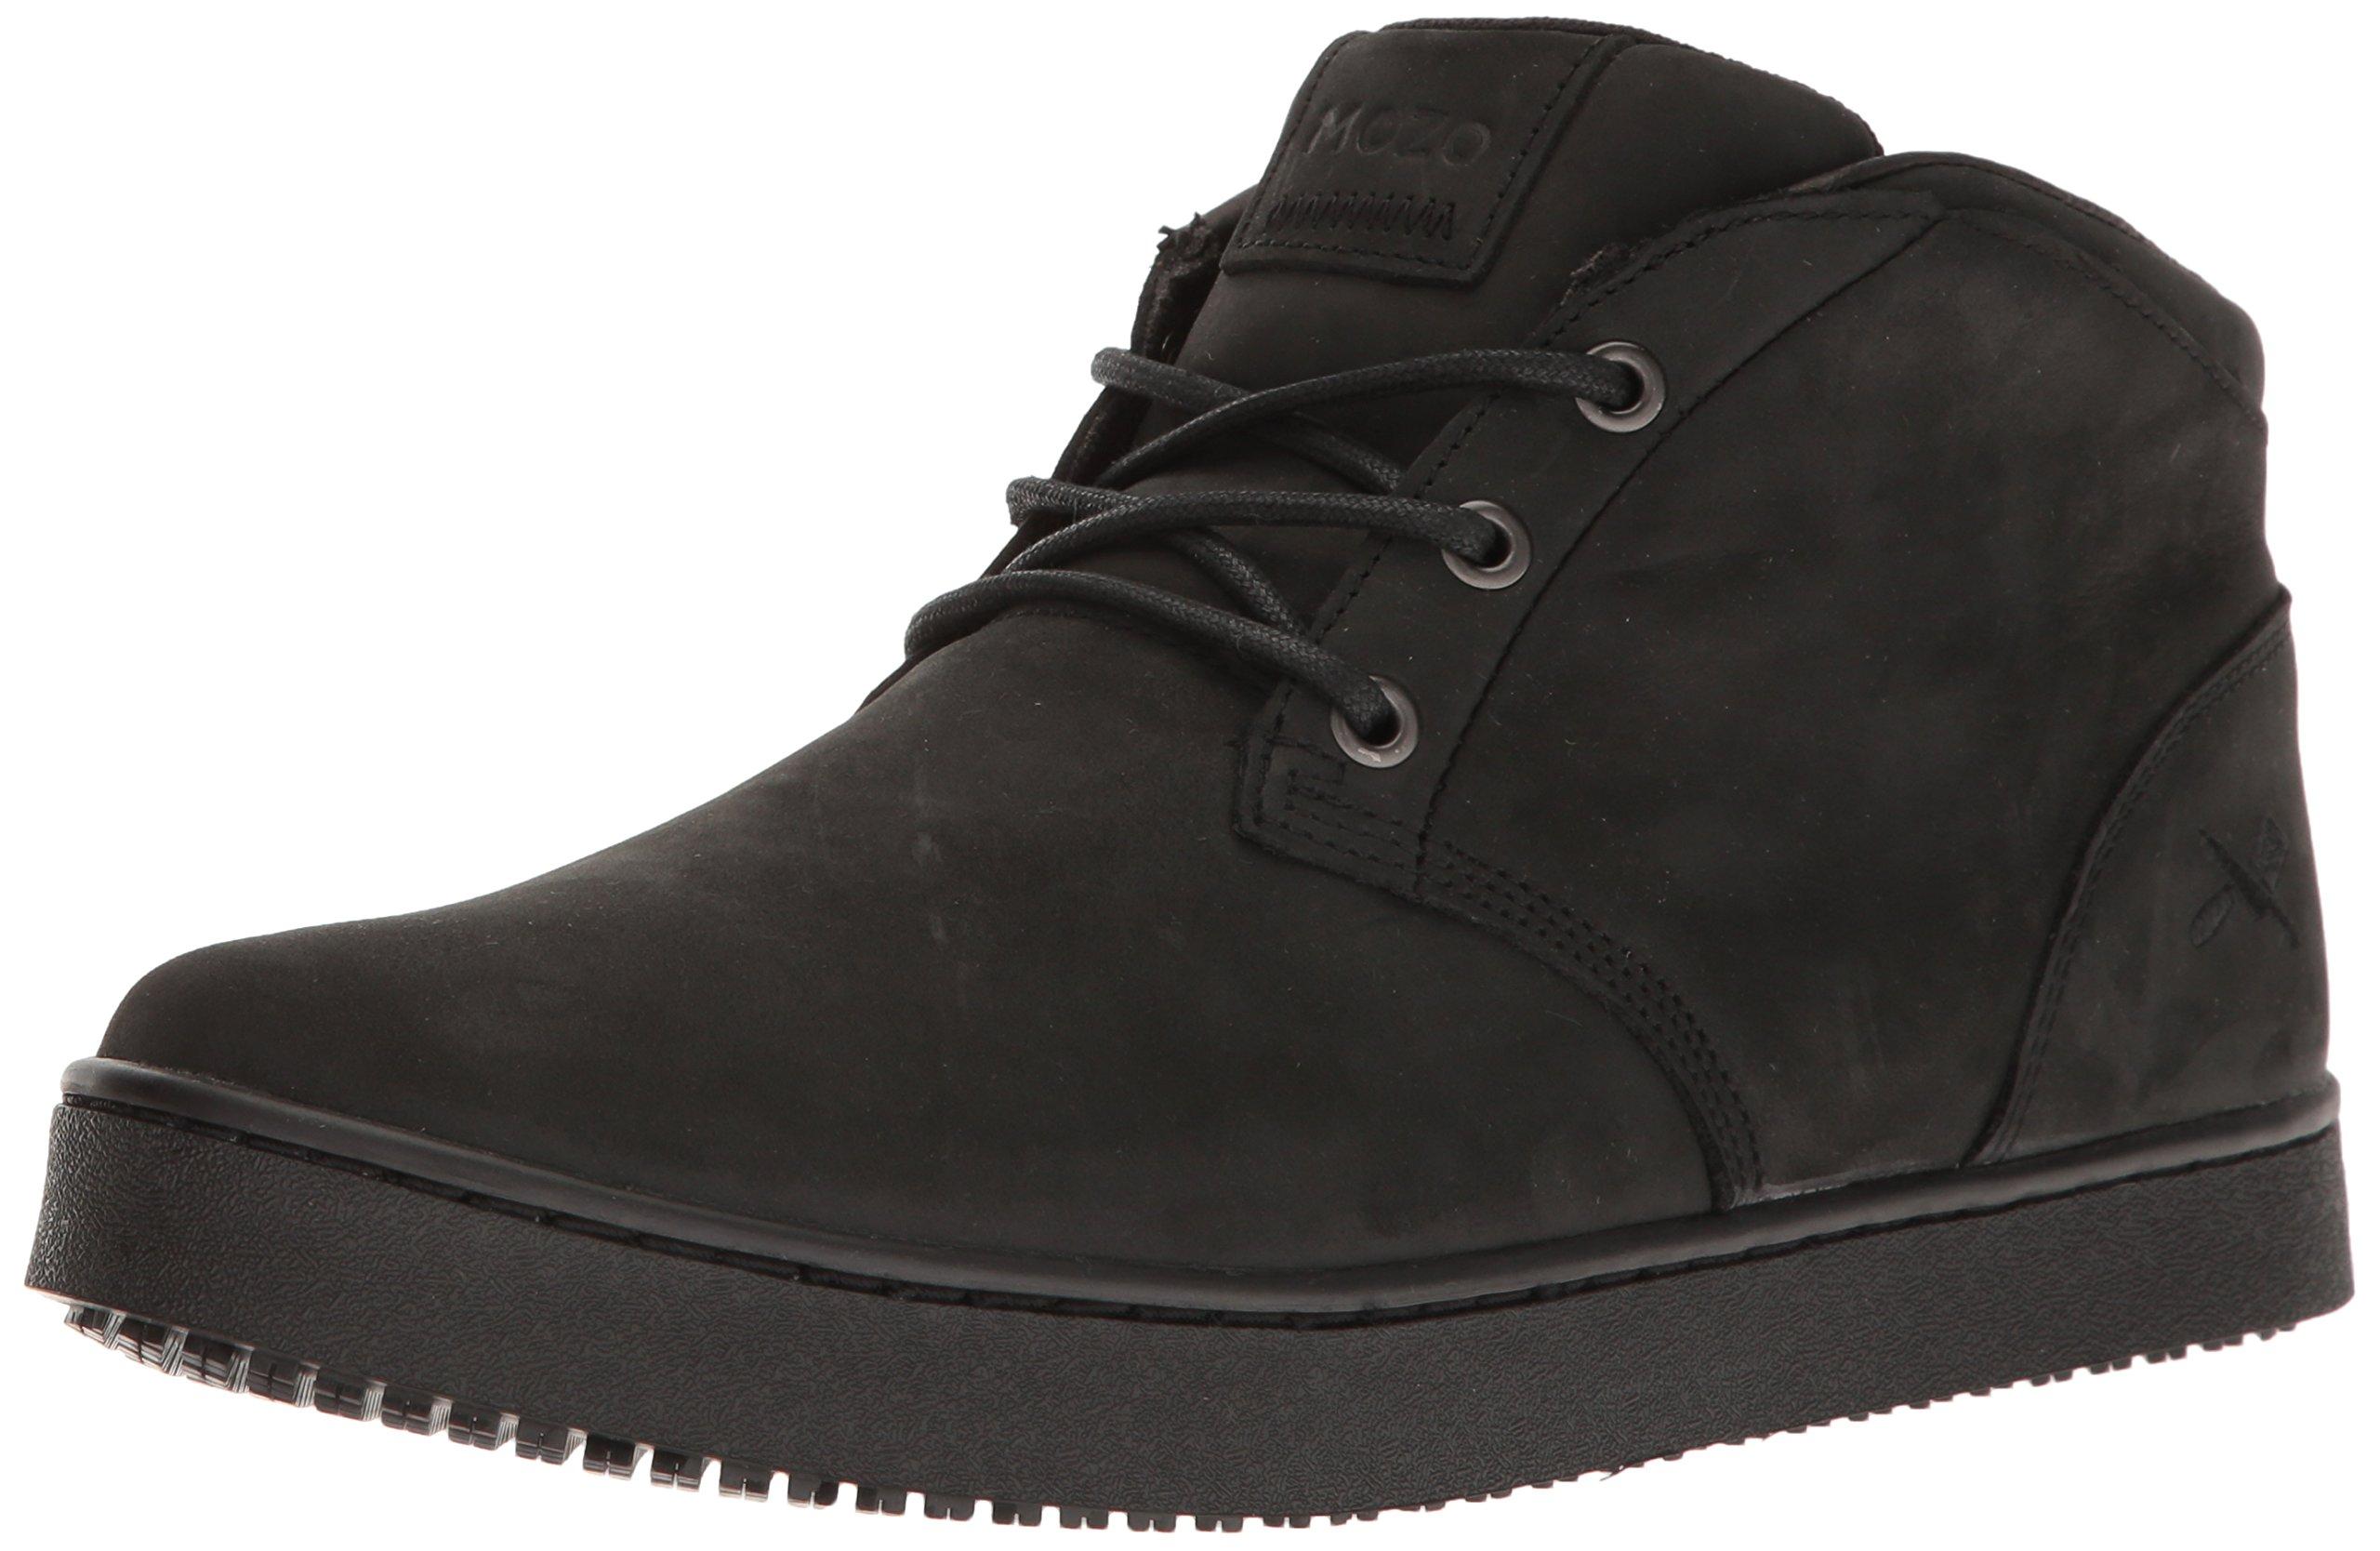 MOZO Men's FINN Chukka Industrial & Construction Shoe, Black, 10.5 D US by MOZO